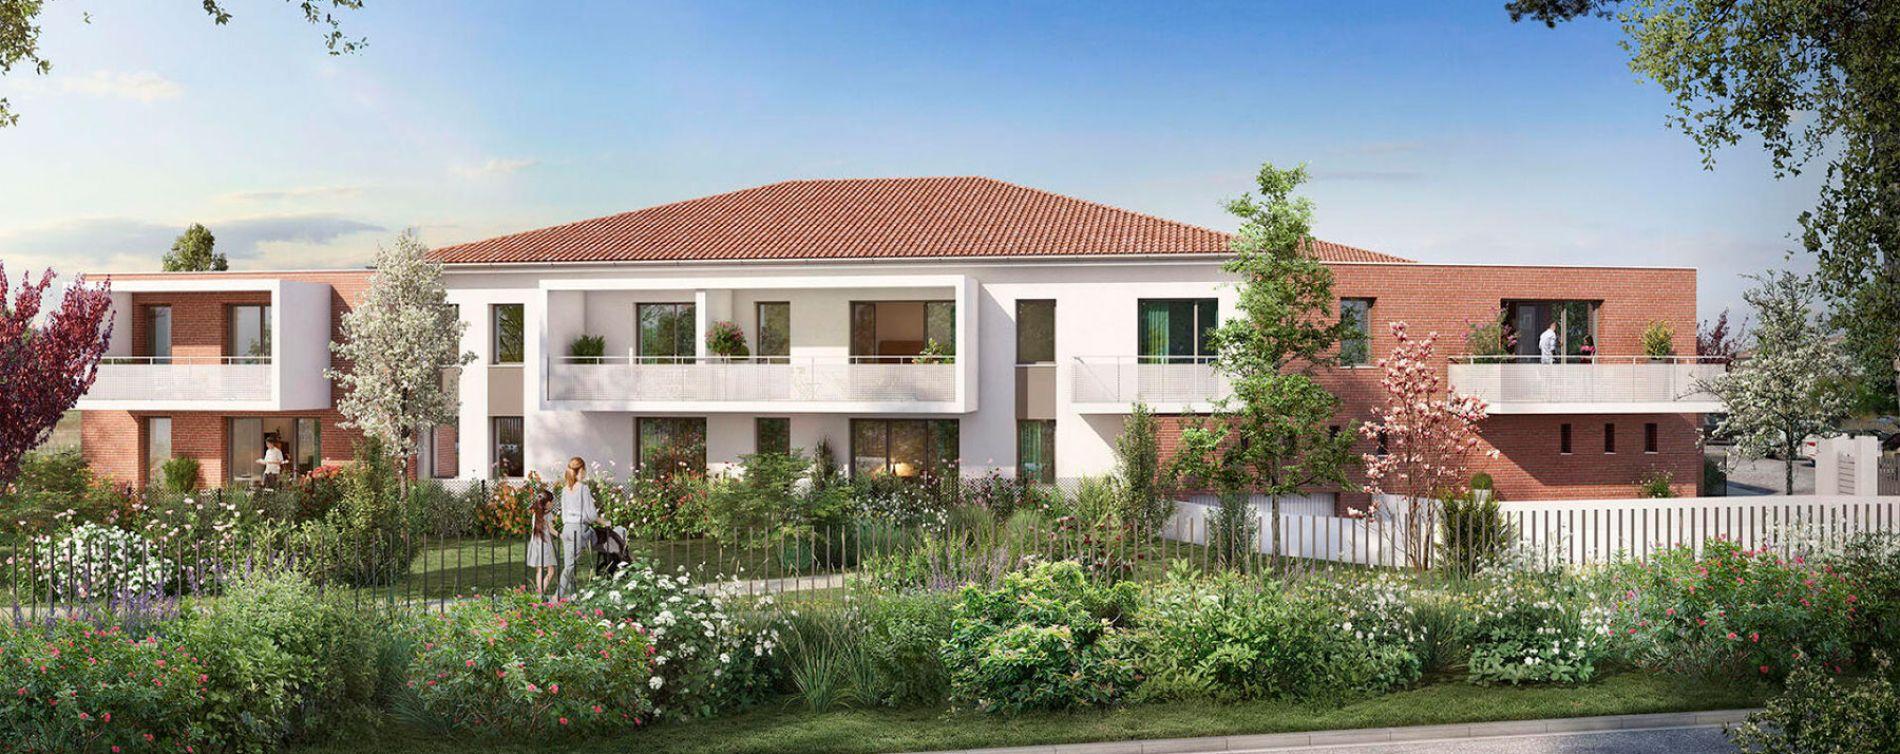 Mondonville : programme immobilier neuve « Programme immobilier n°218335 » (2)